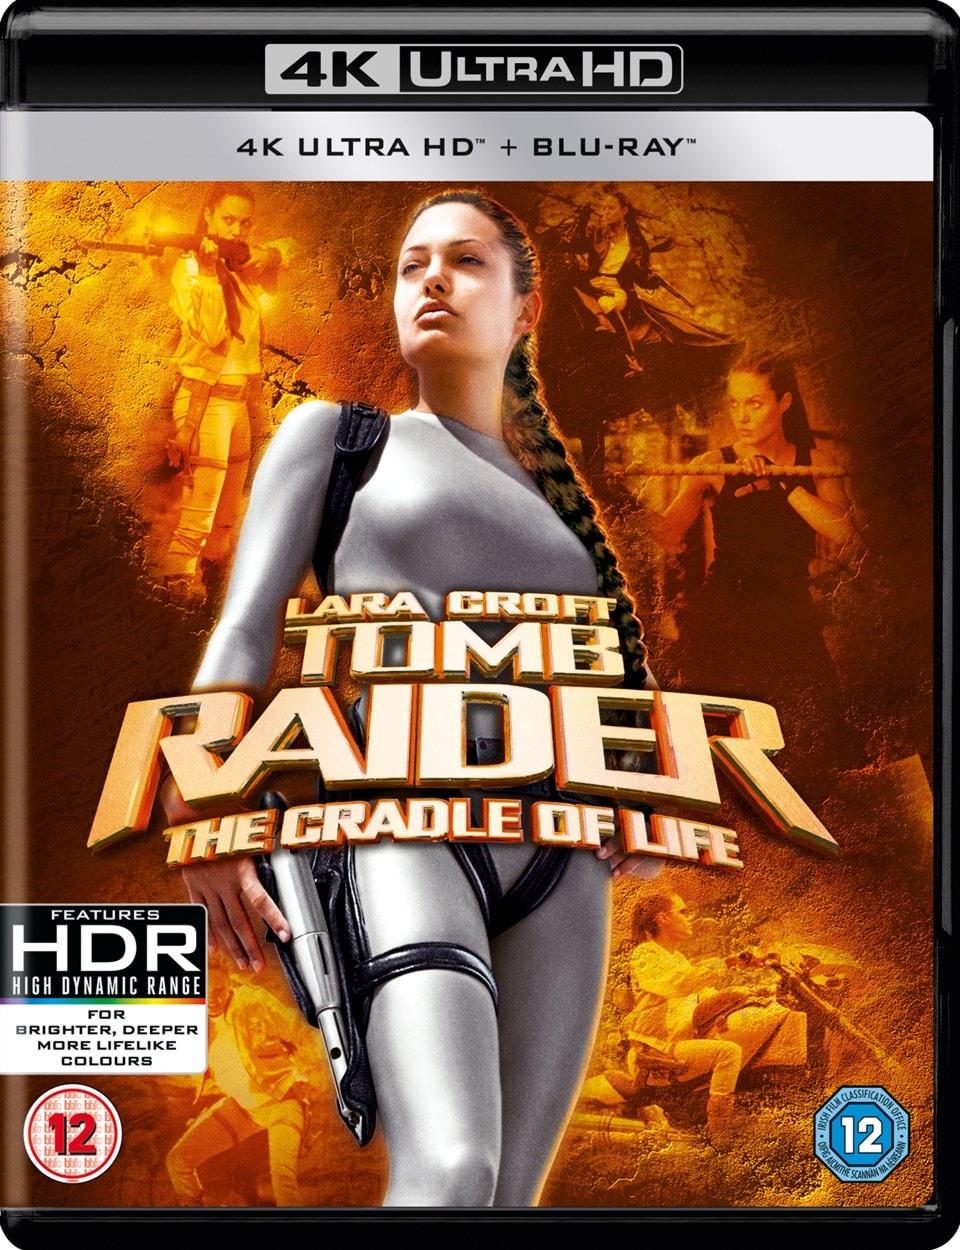 Lara Croft - Tomb Raider: The Cradle of Life - 1